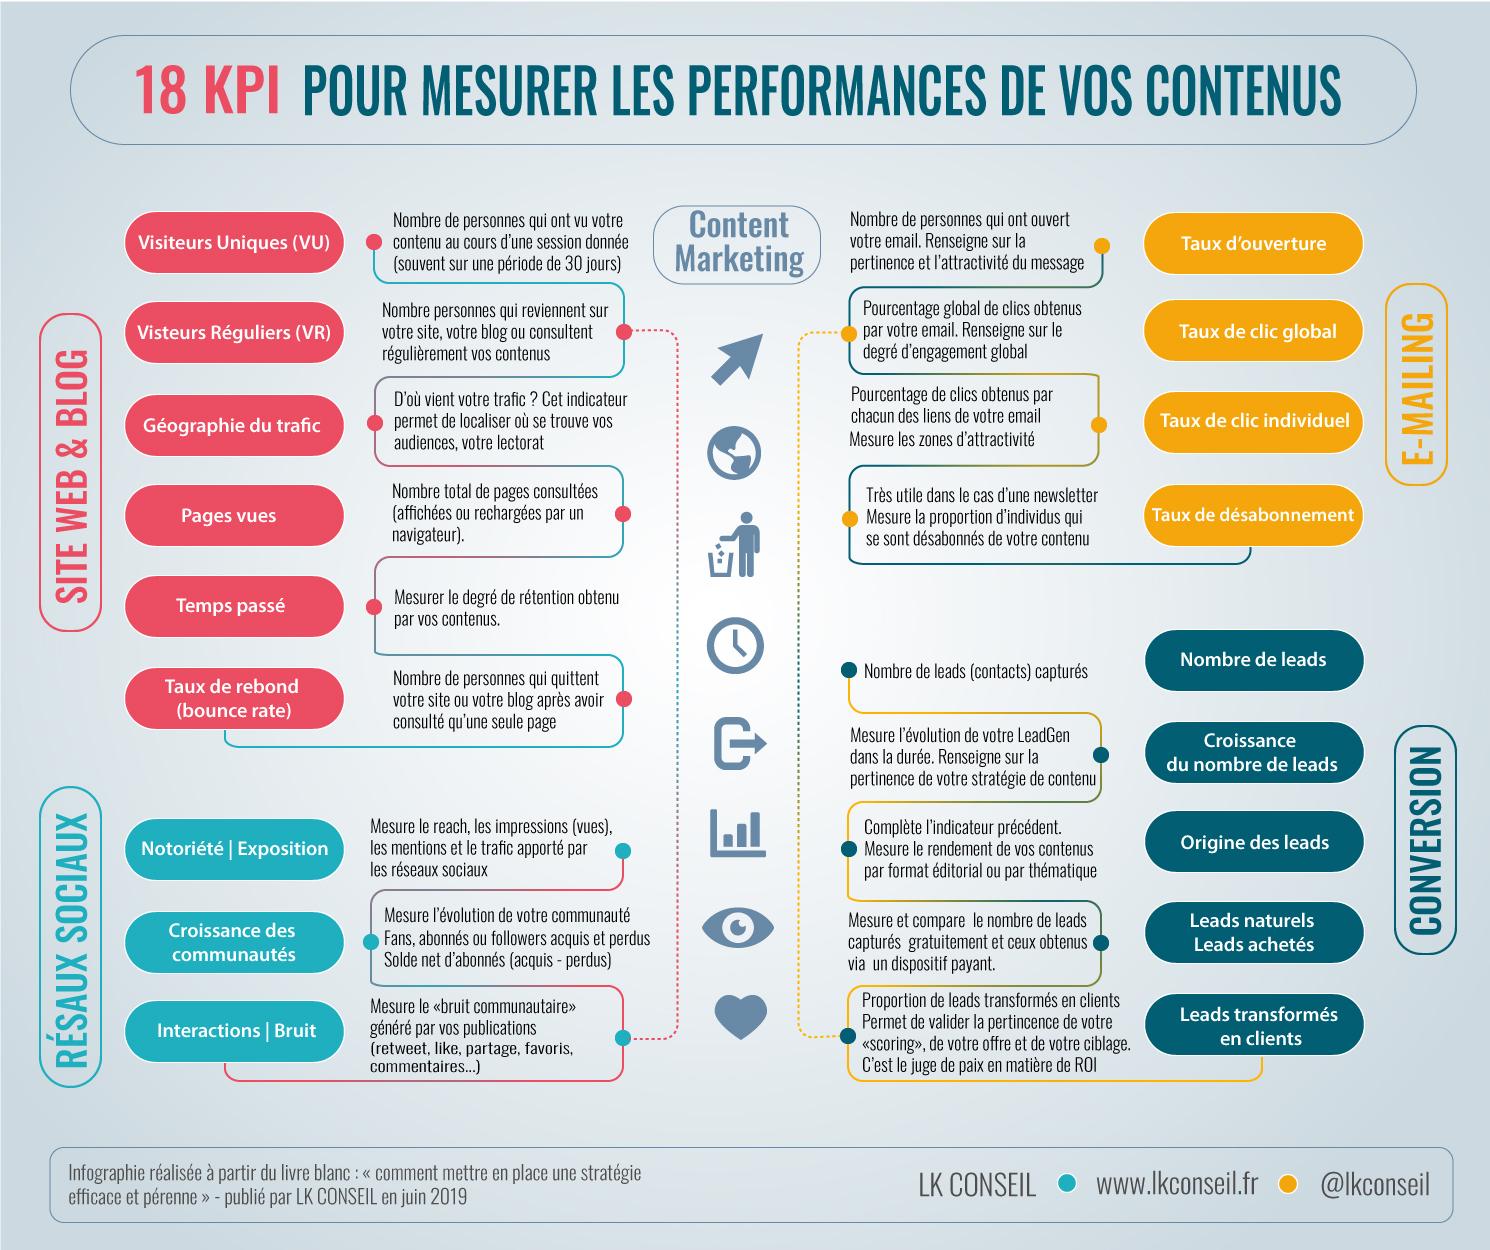 18-KPI-Marketing-Contenu.jpg